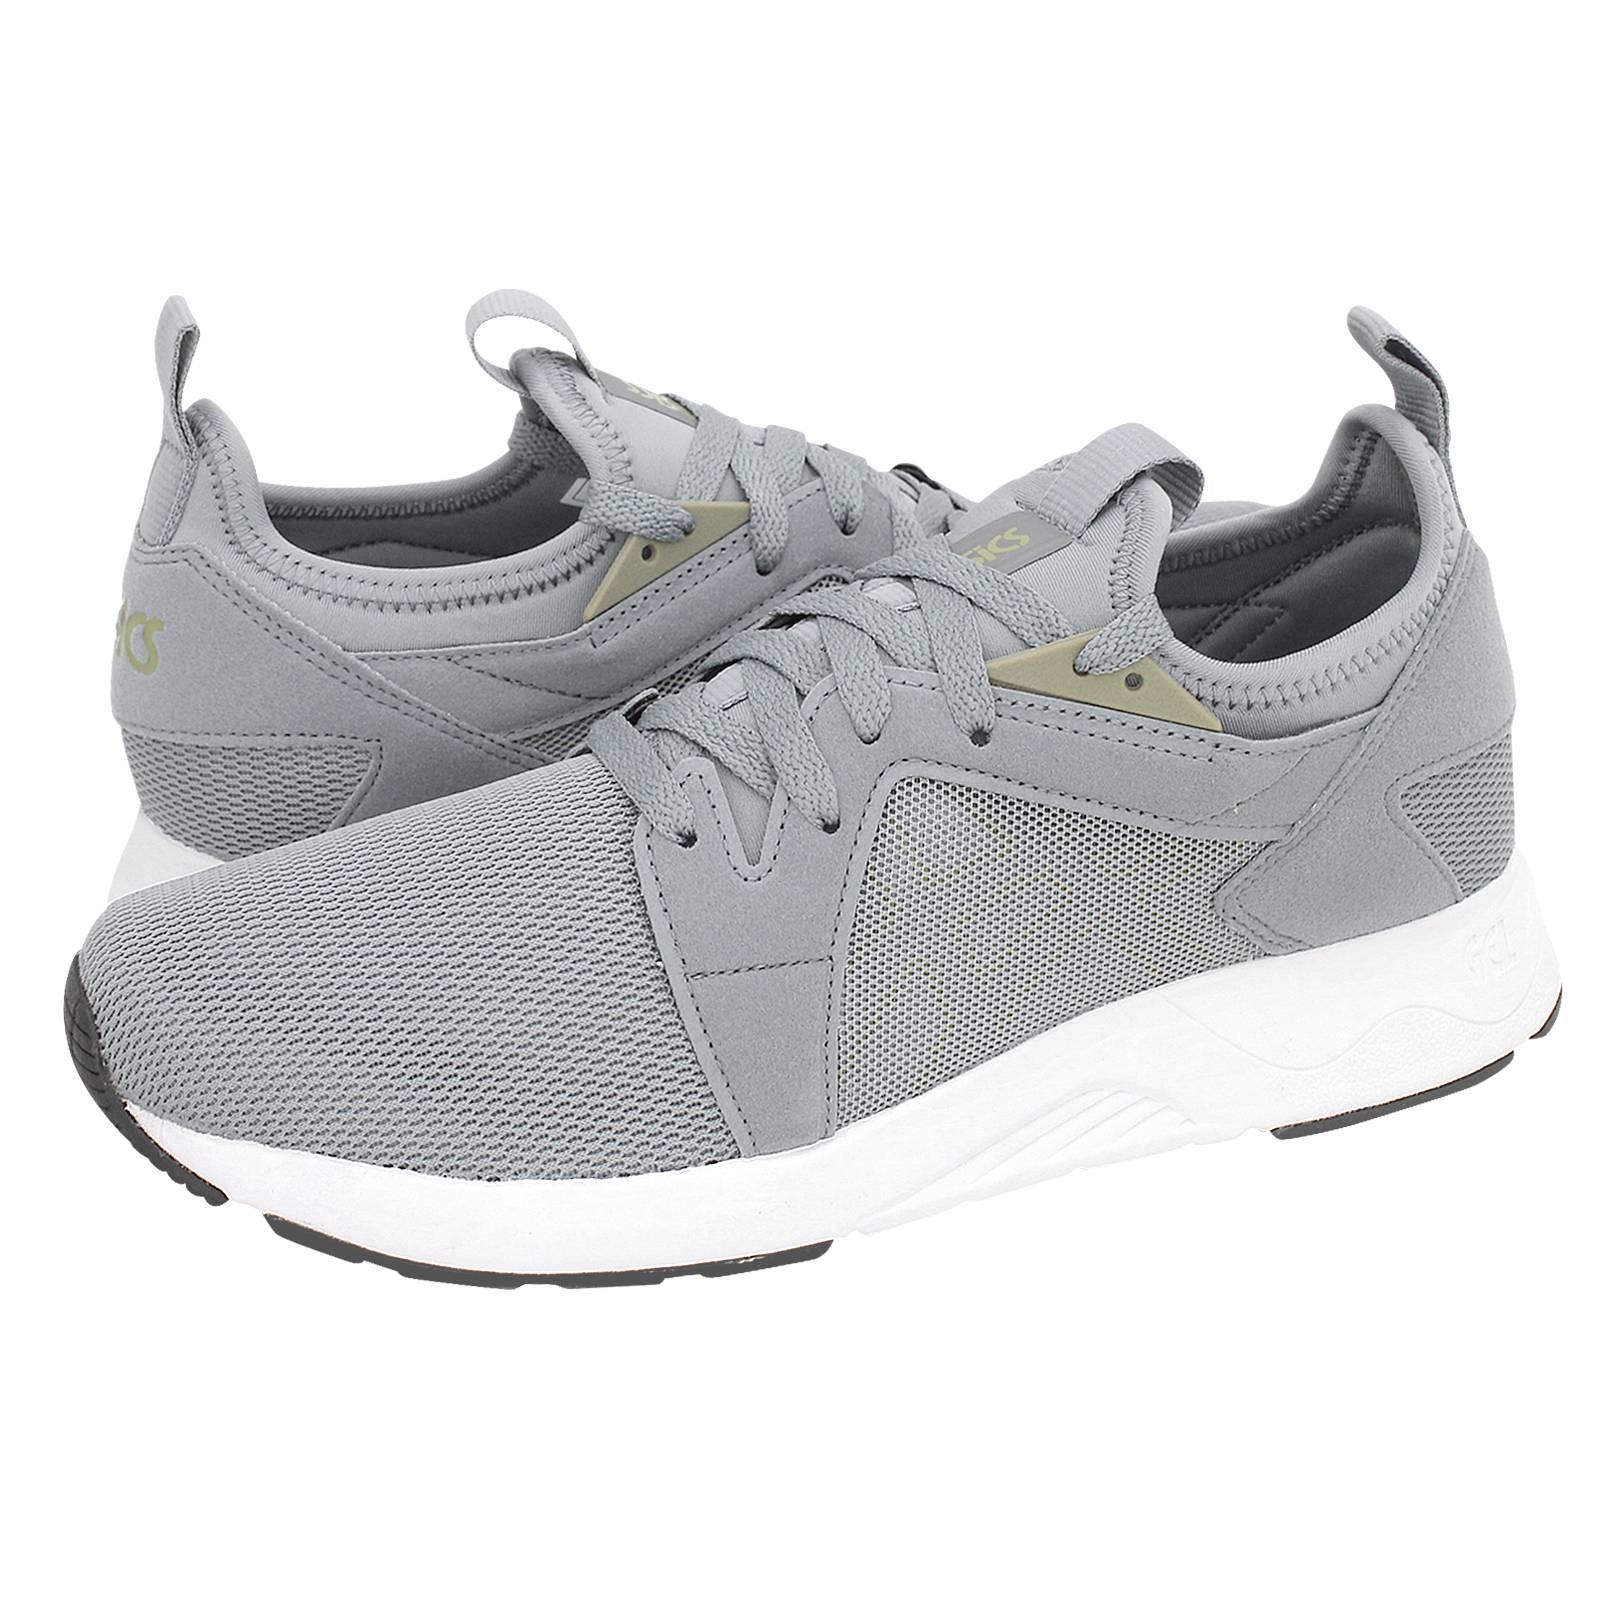 Asics Gel-Lyte V RB athletic shoes